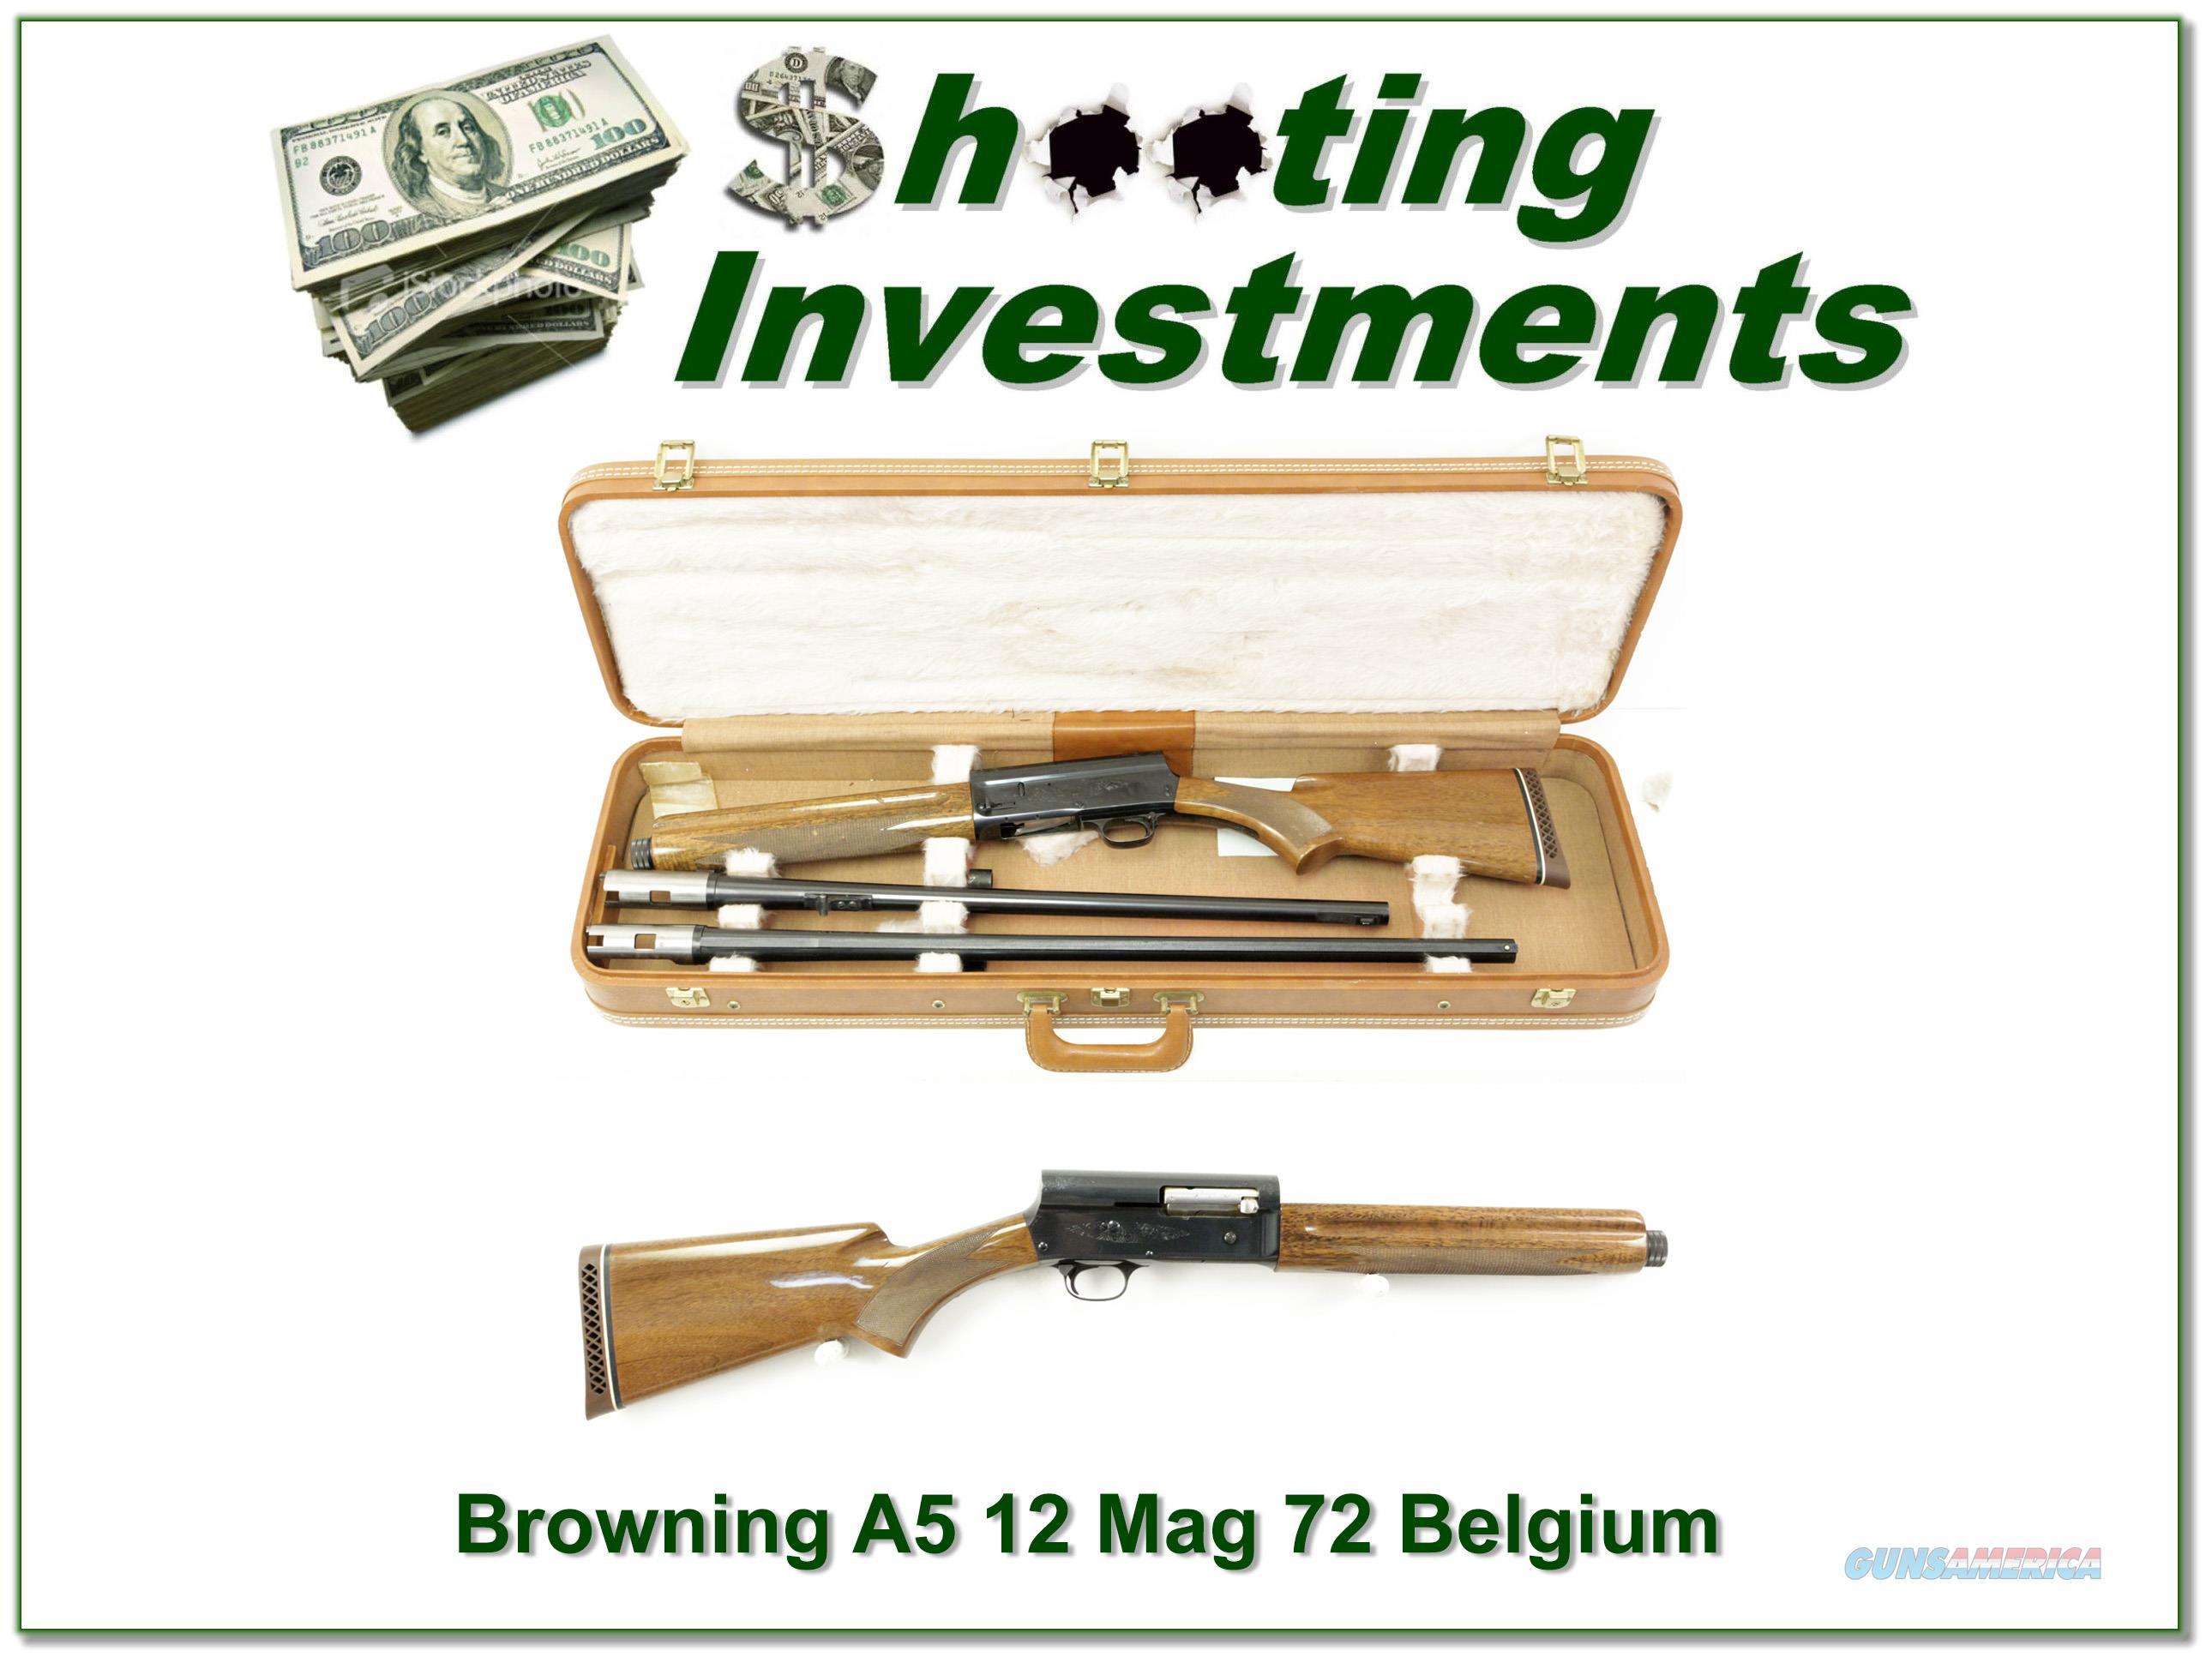 Browning A5 12 Magnum 72 Belgium 2 barrel set  Guns > Shotguns > Browning Shotguns > Autoloaders > Hunting